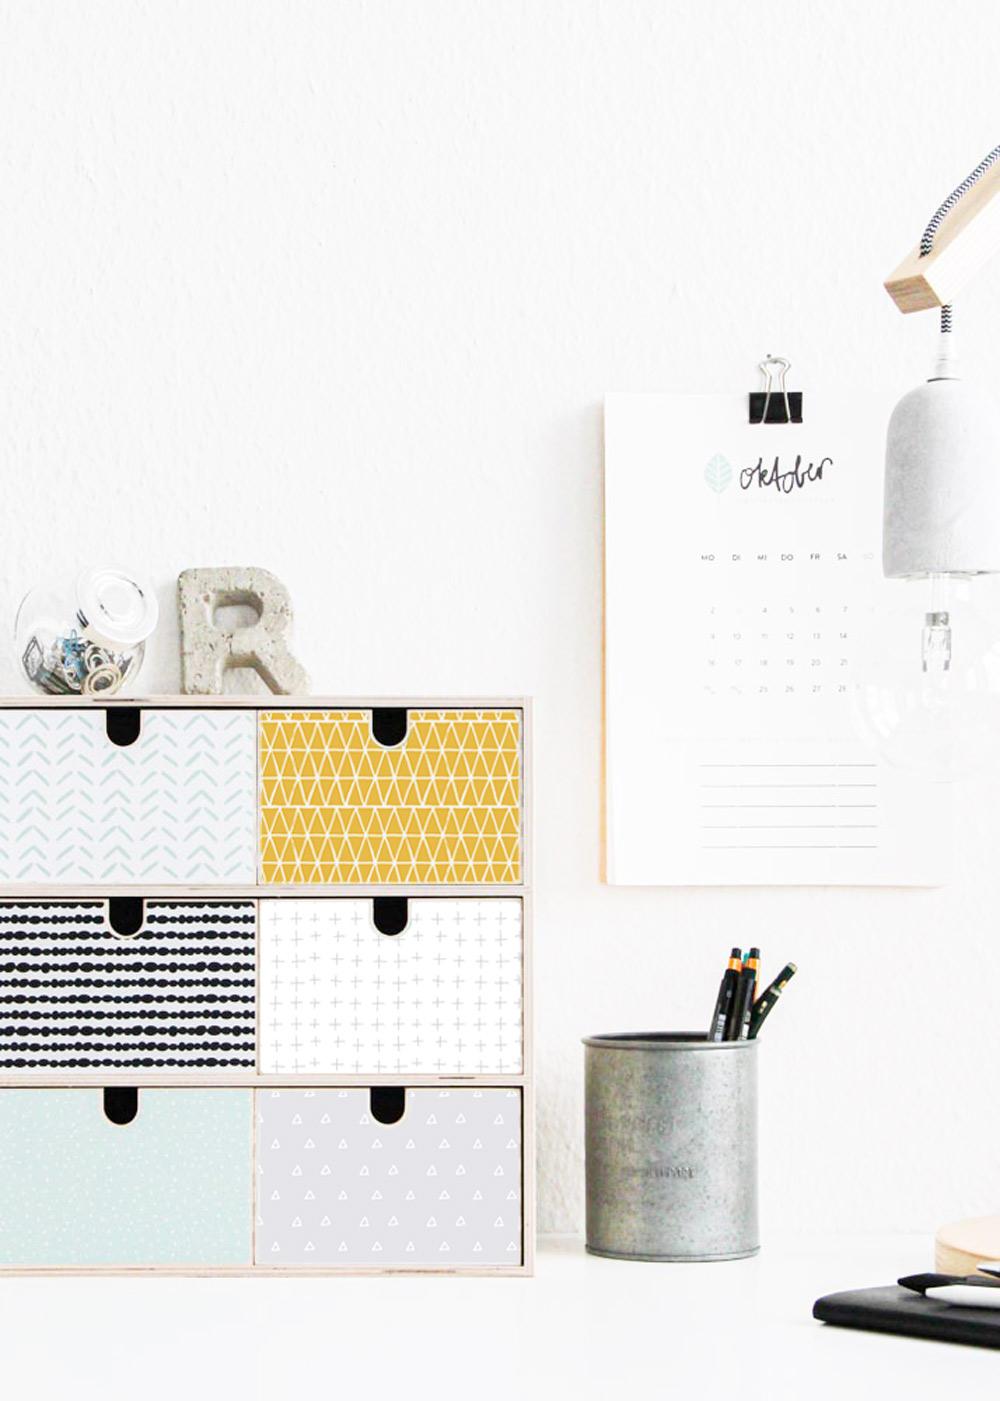 Ikea Moppe Mini Kommode Musta Senf Mint 31x18x32 Gesamt Schreibtisch